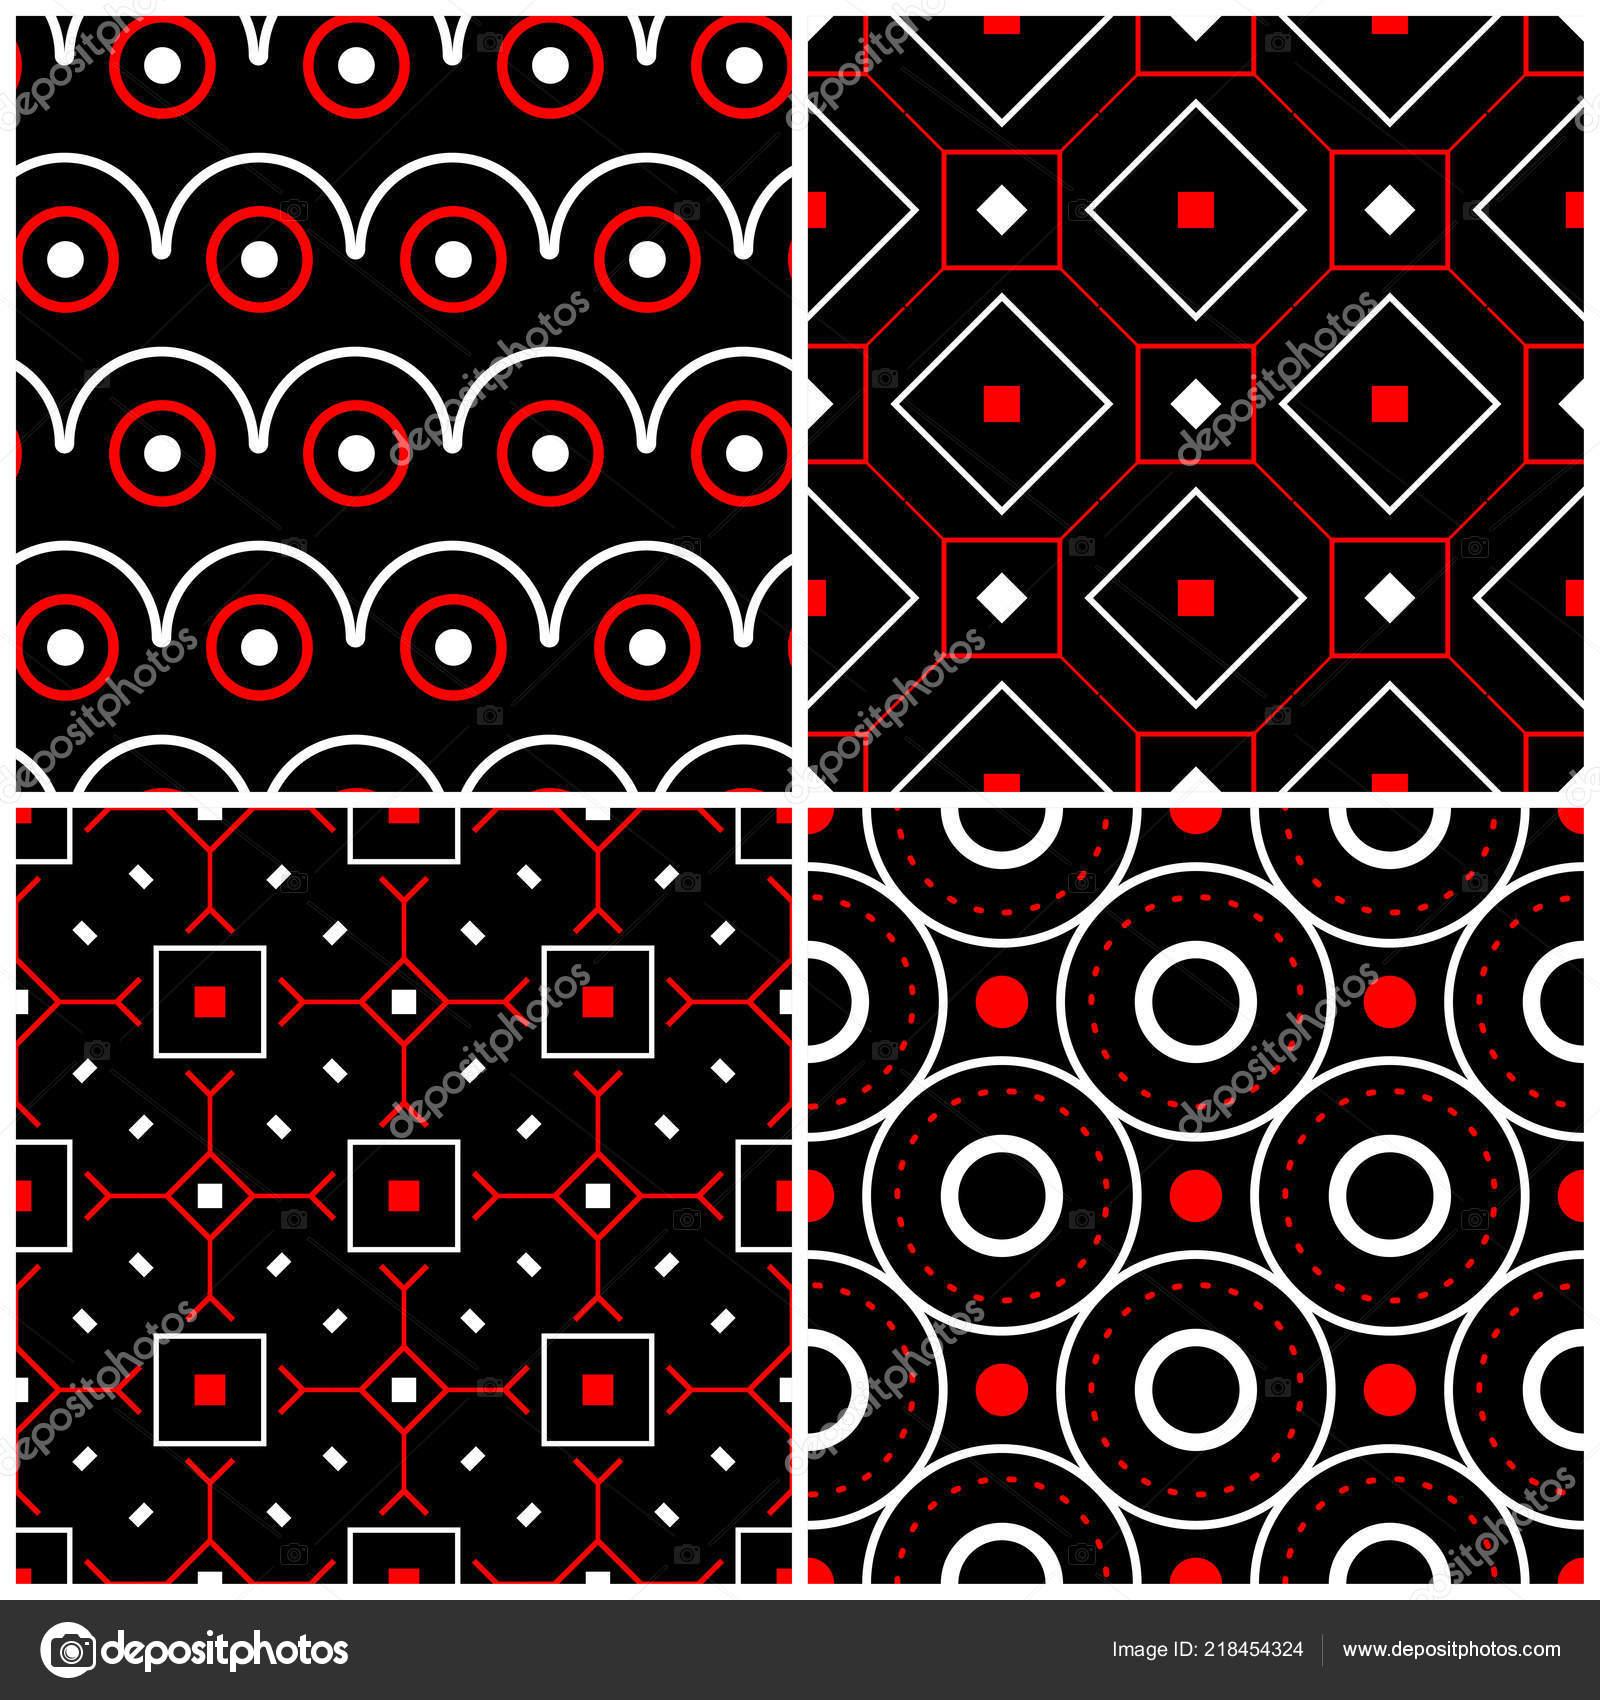 depositphotos 218454324 stock illustration seamless black white red patterns